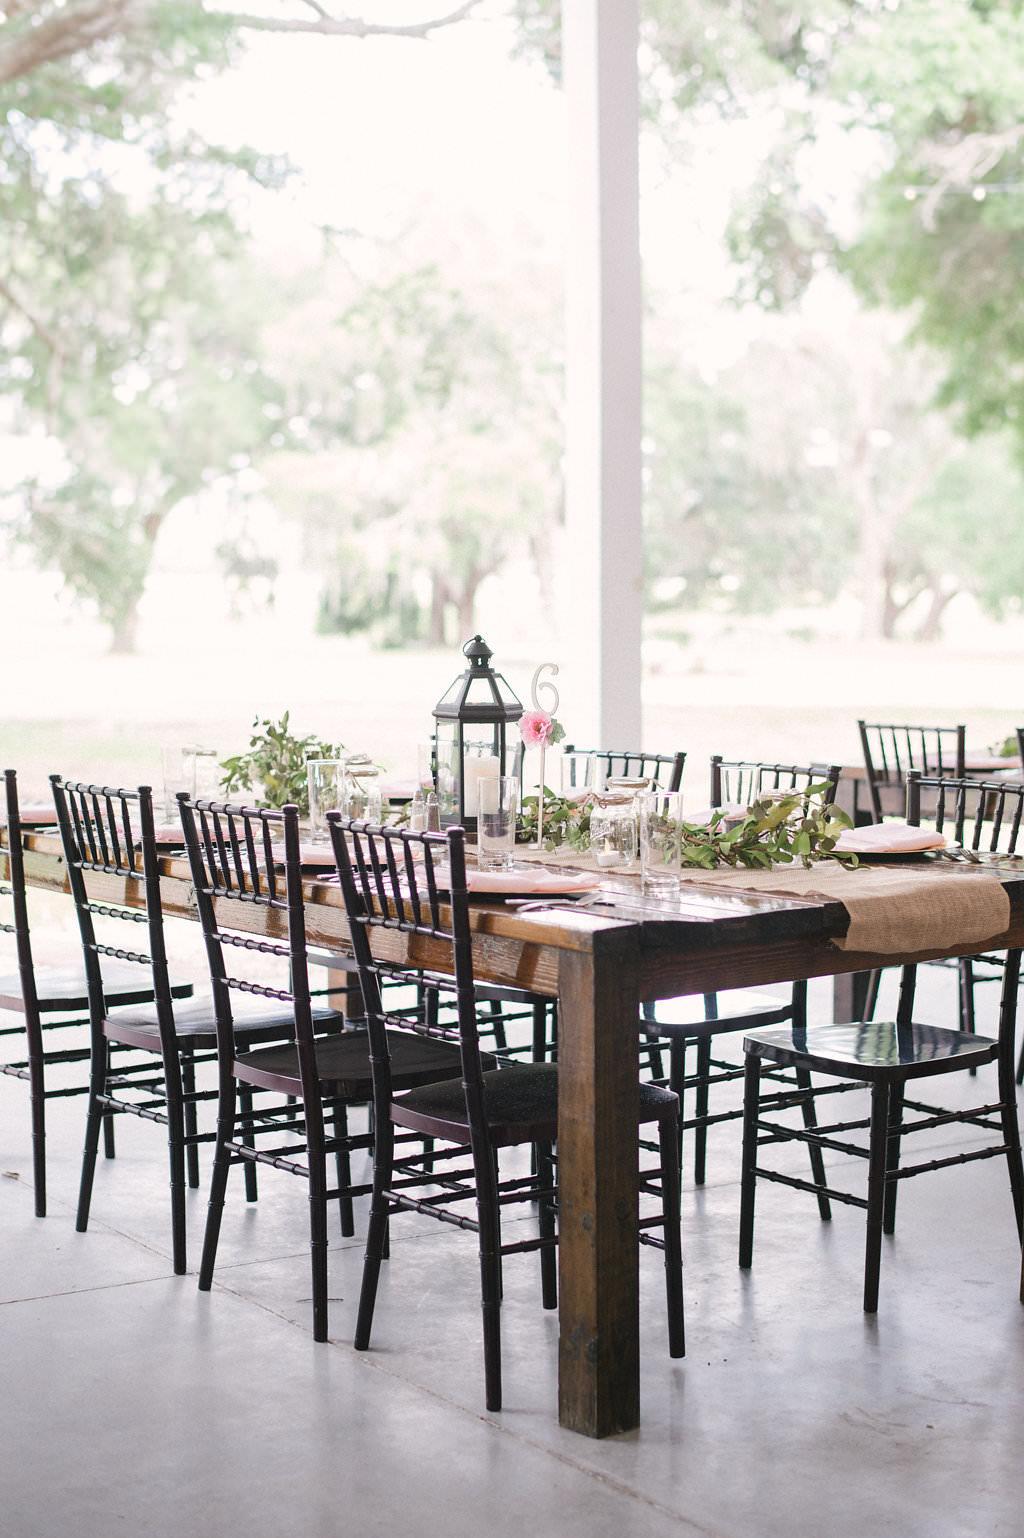 Tampa Bay Rustic Wedding Reception Decor, Long Wooden Table with Black Chiavari Chairs, Burlap Table Runner, Black Lantern and Greenery Garland